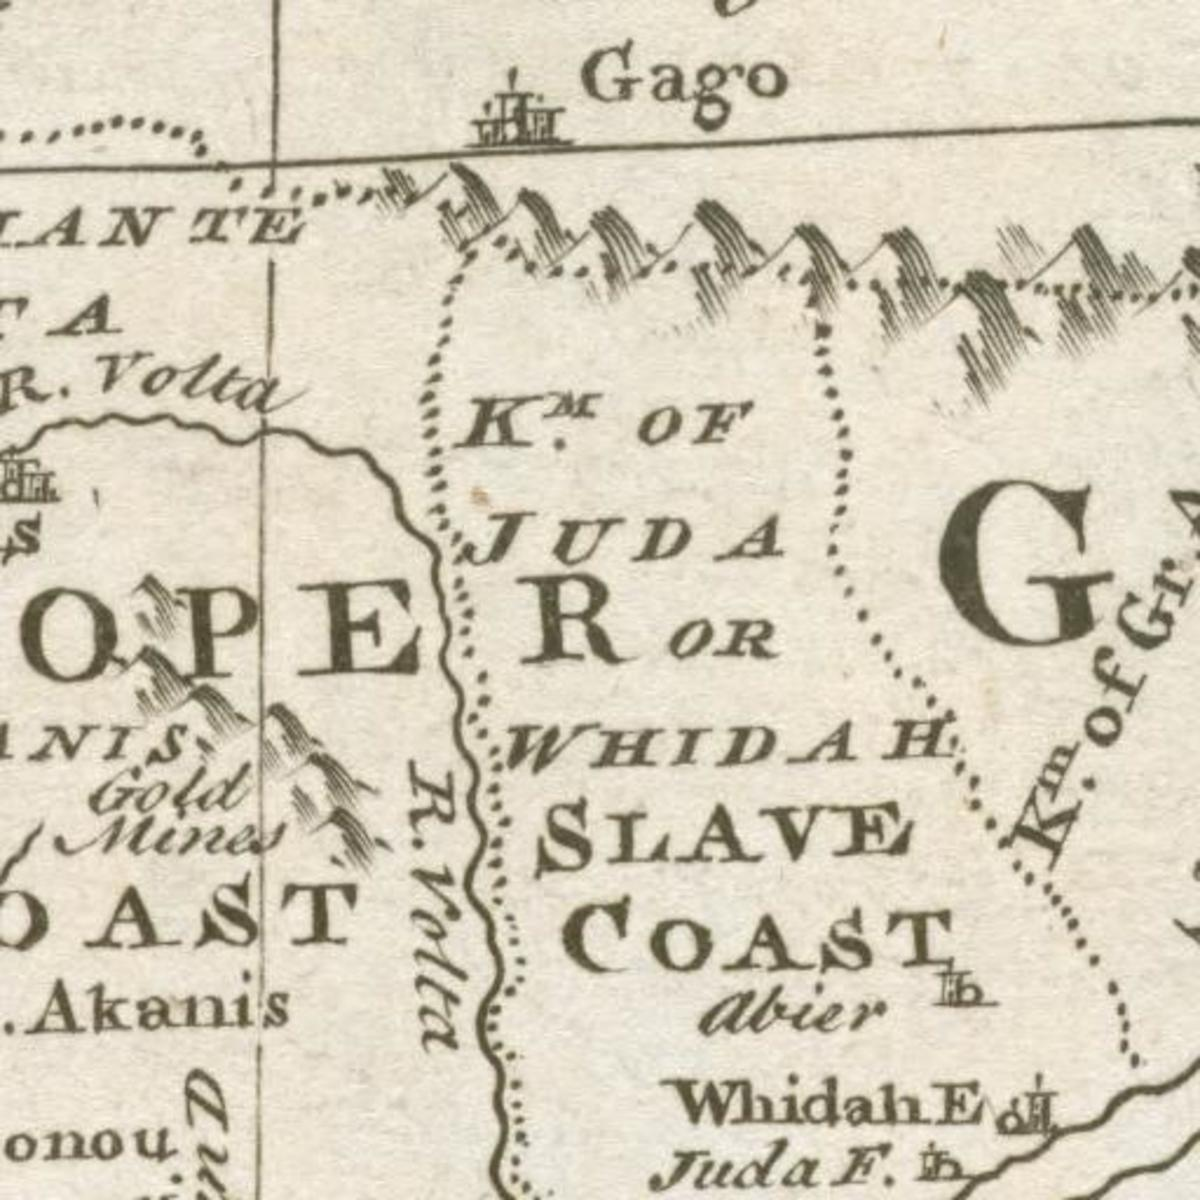 The Kingdom of Juda renamed the Slave Coast